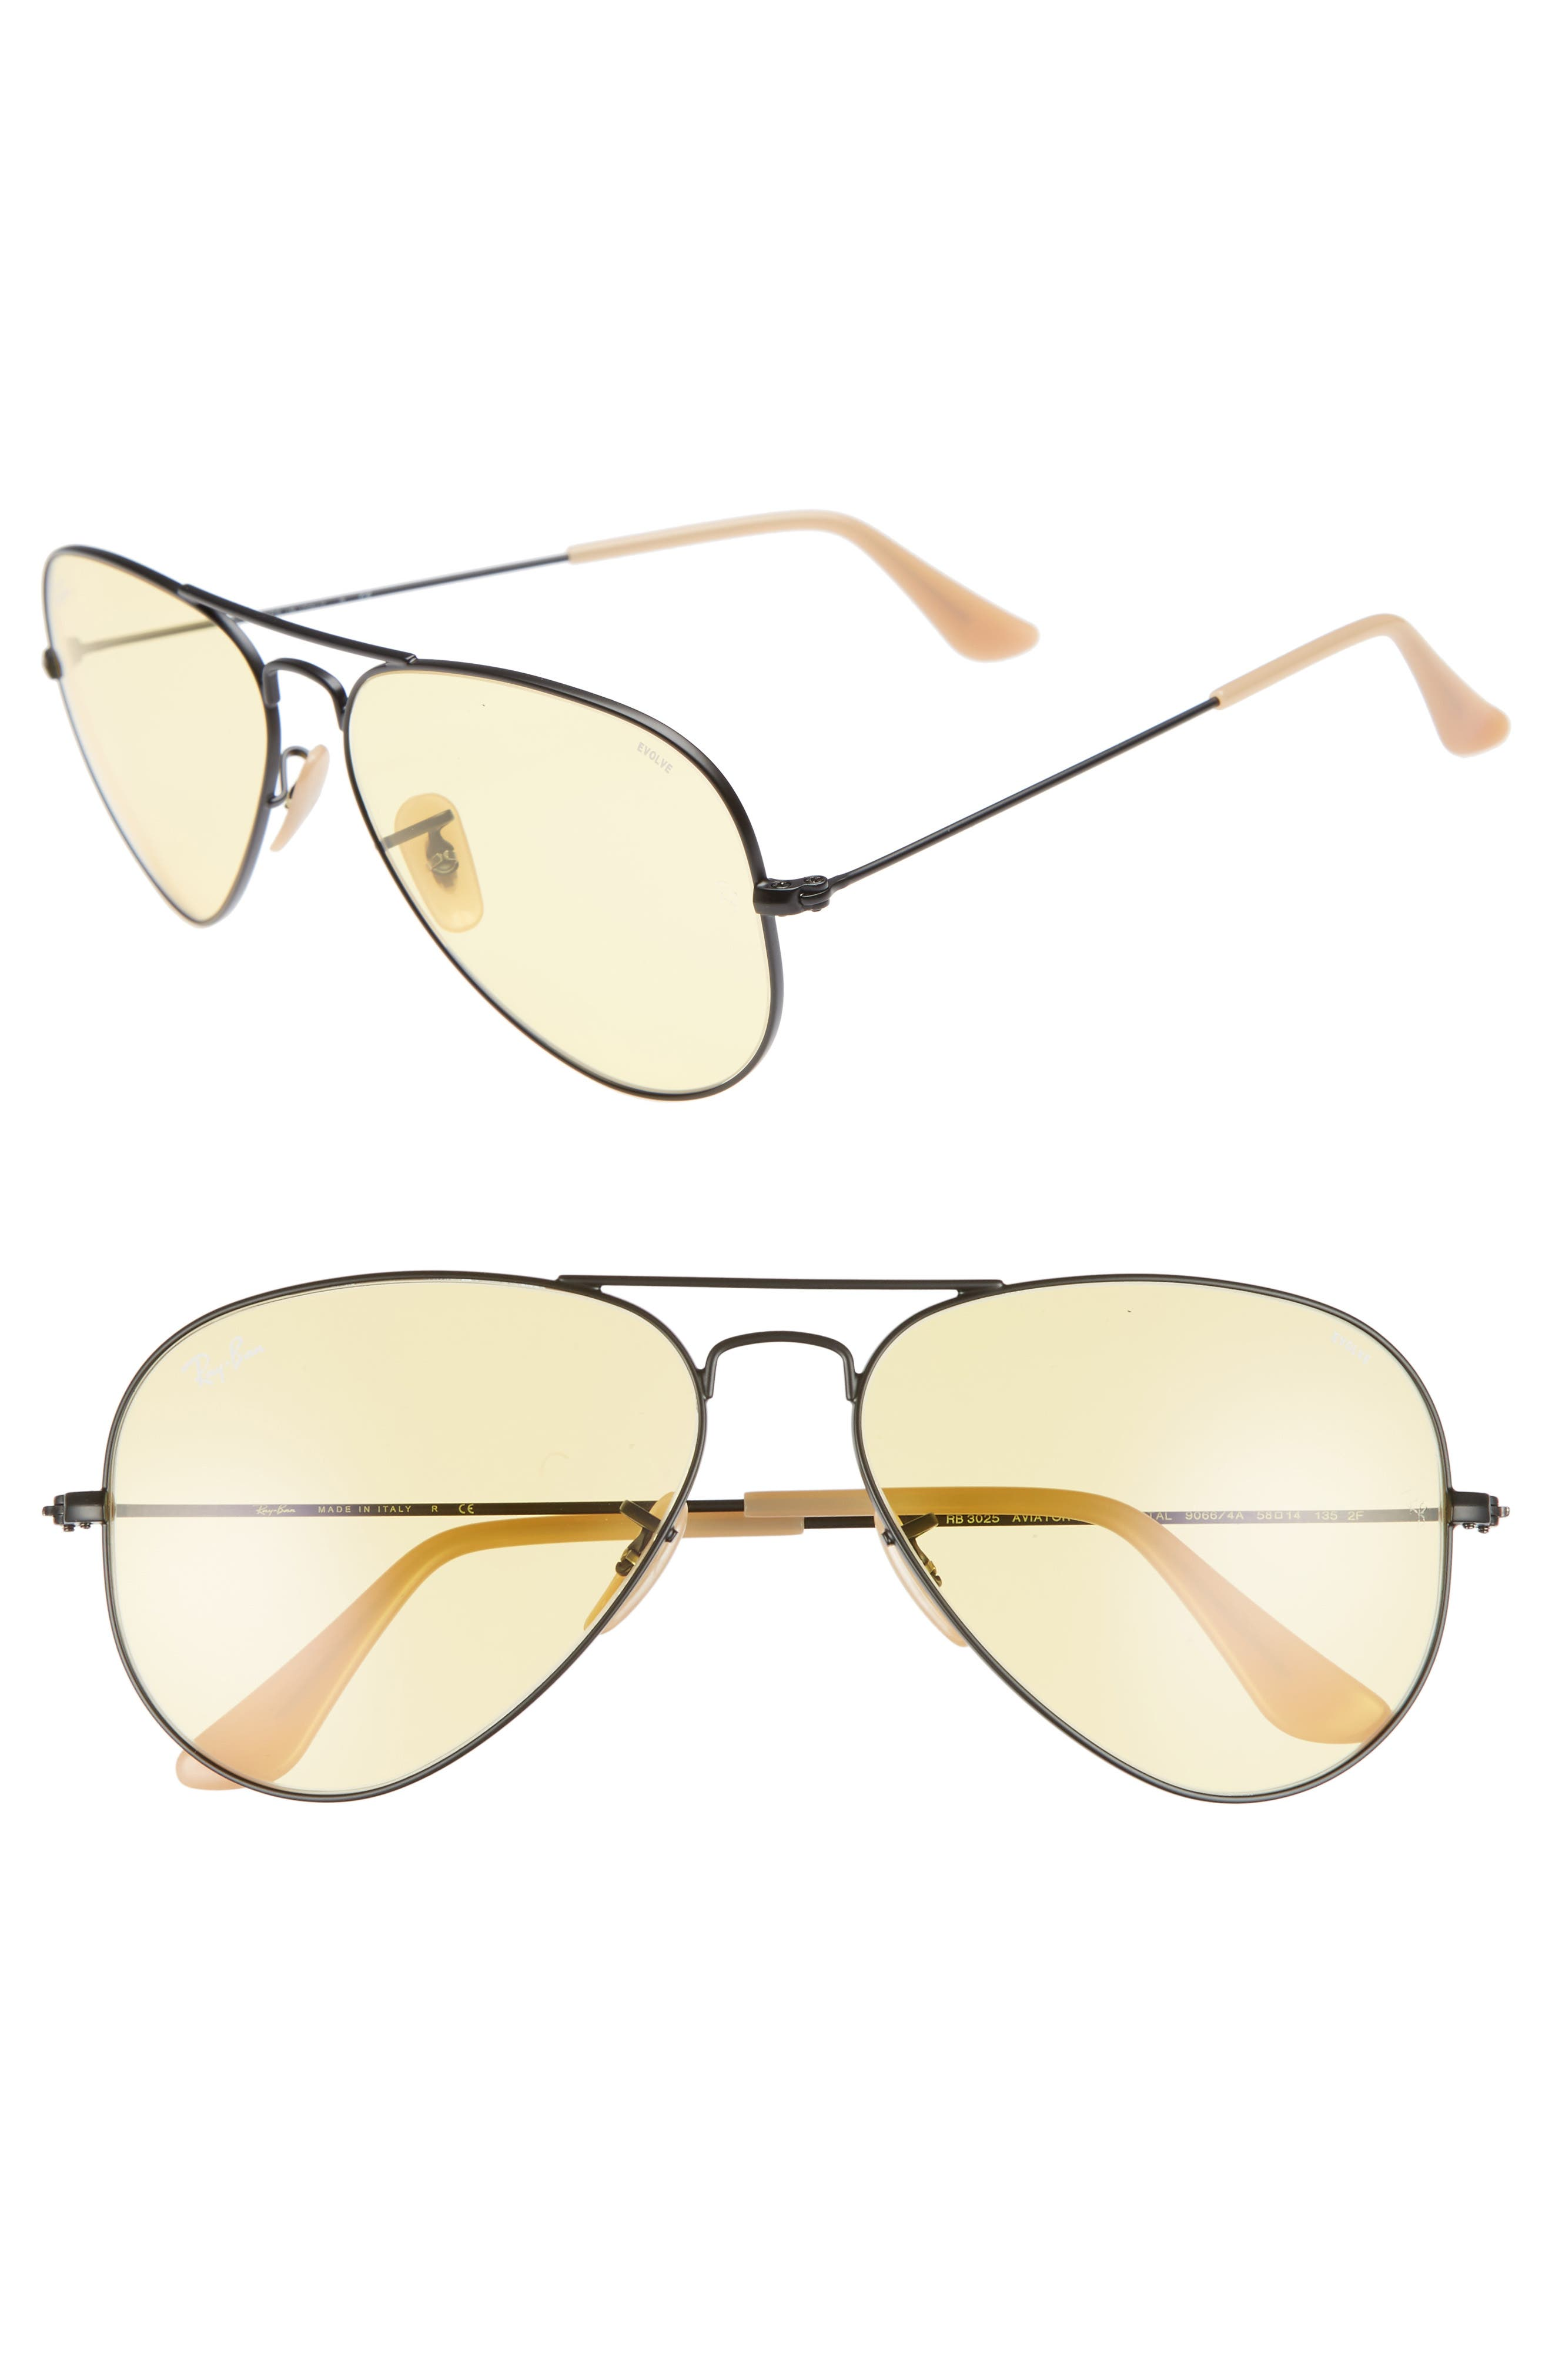 Evolve 58mm Polarized Aviator Sunglasses,                         Main,                         color, Black